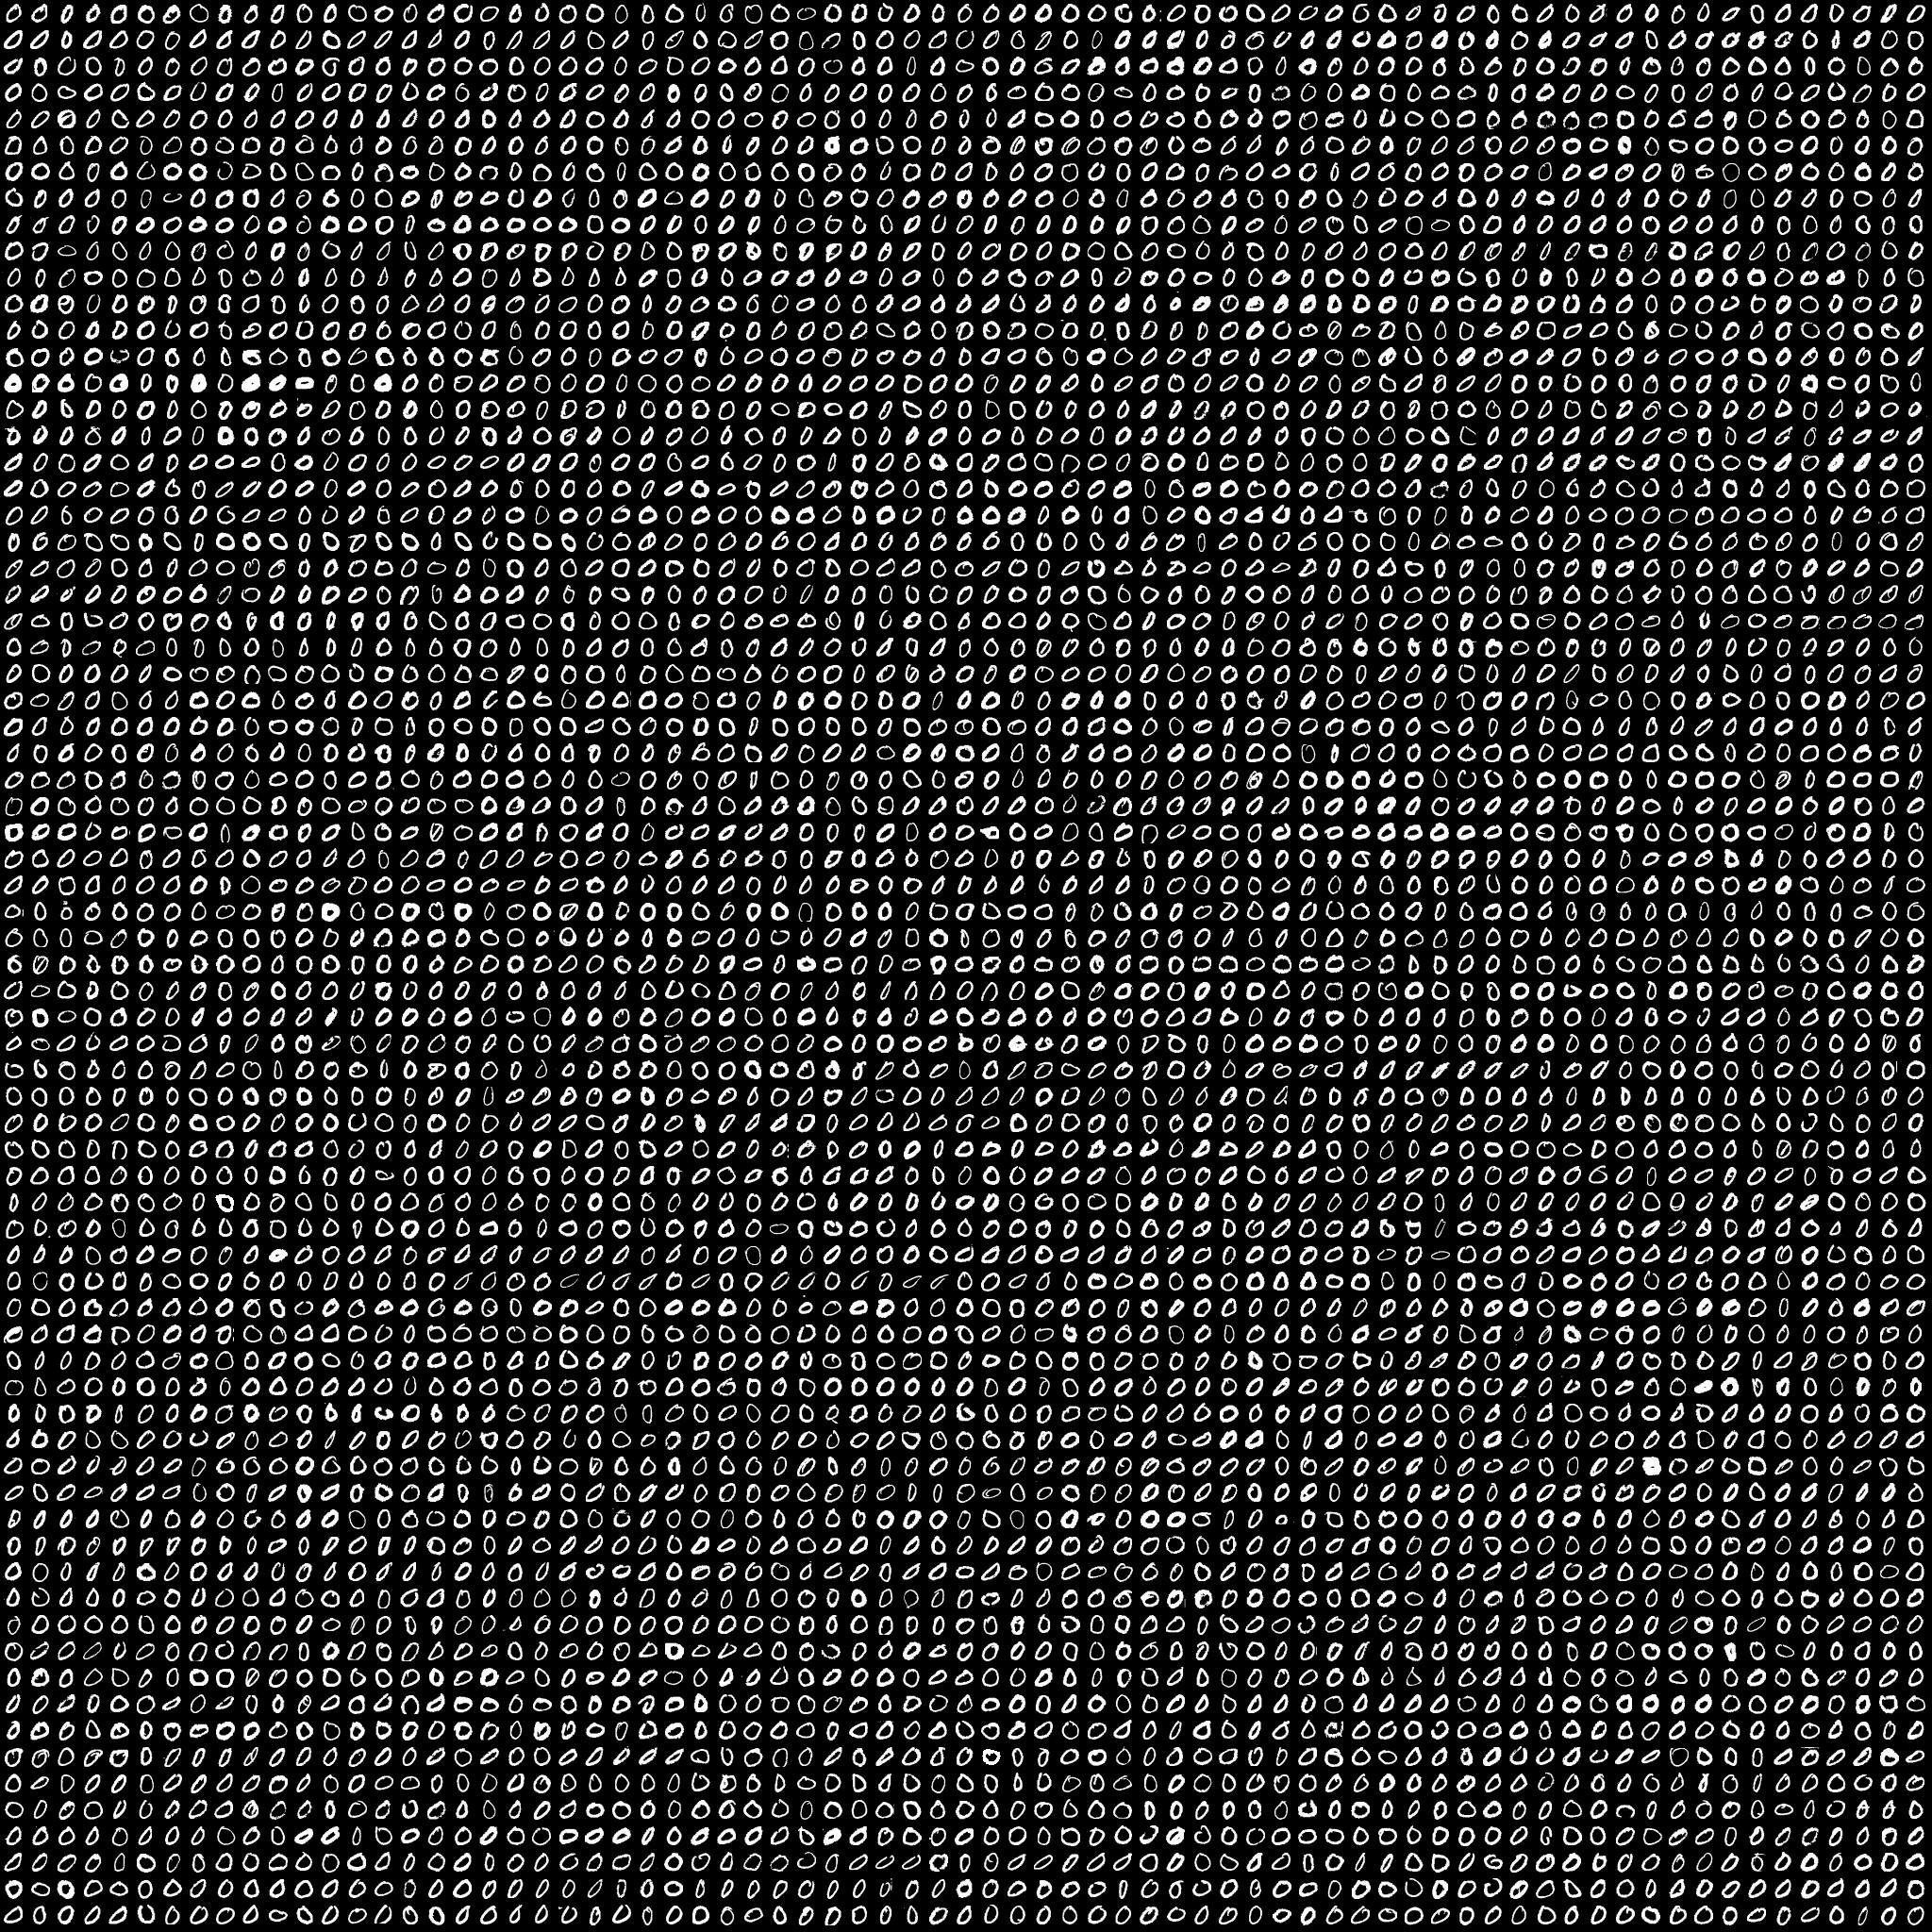 Making an interactive UMAP visualization of the MNIST data set